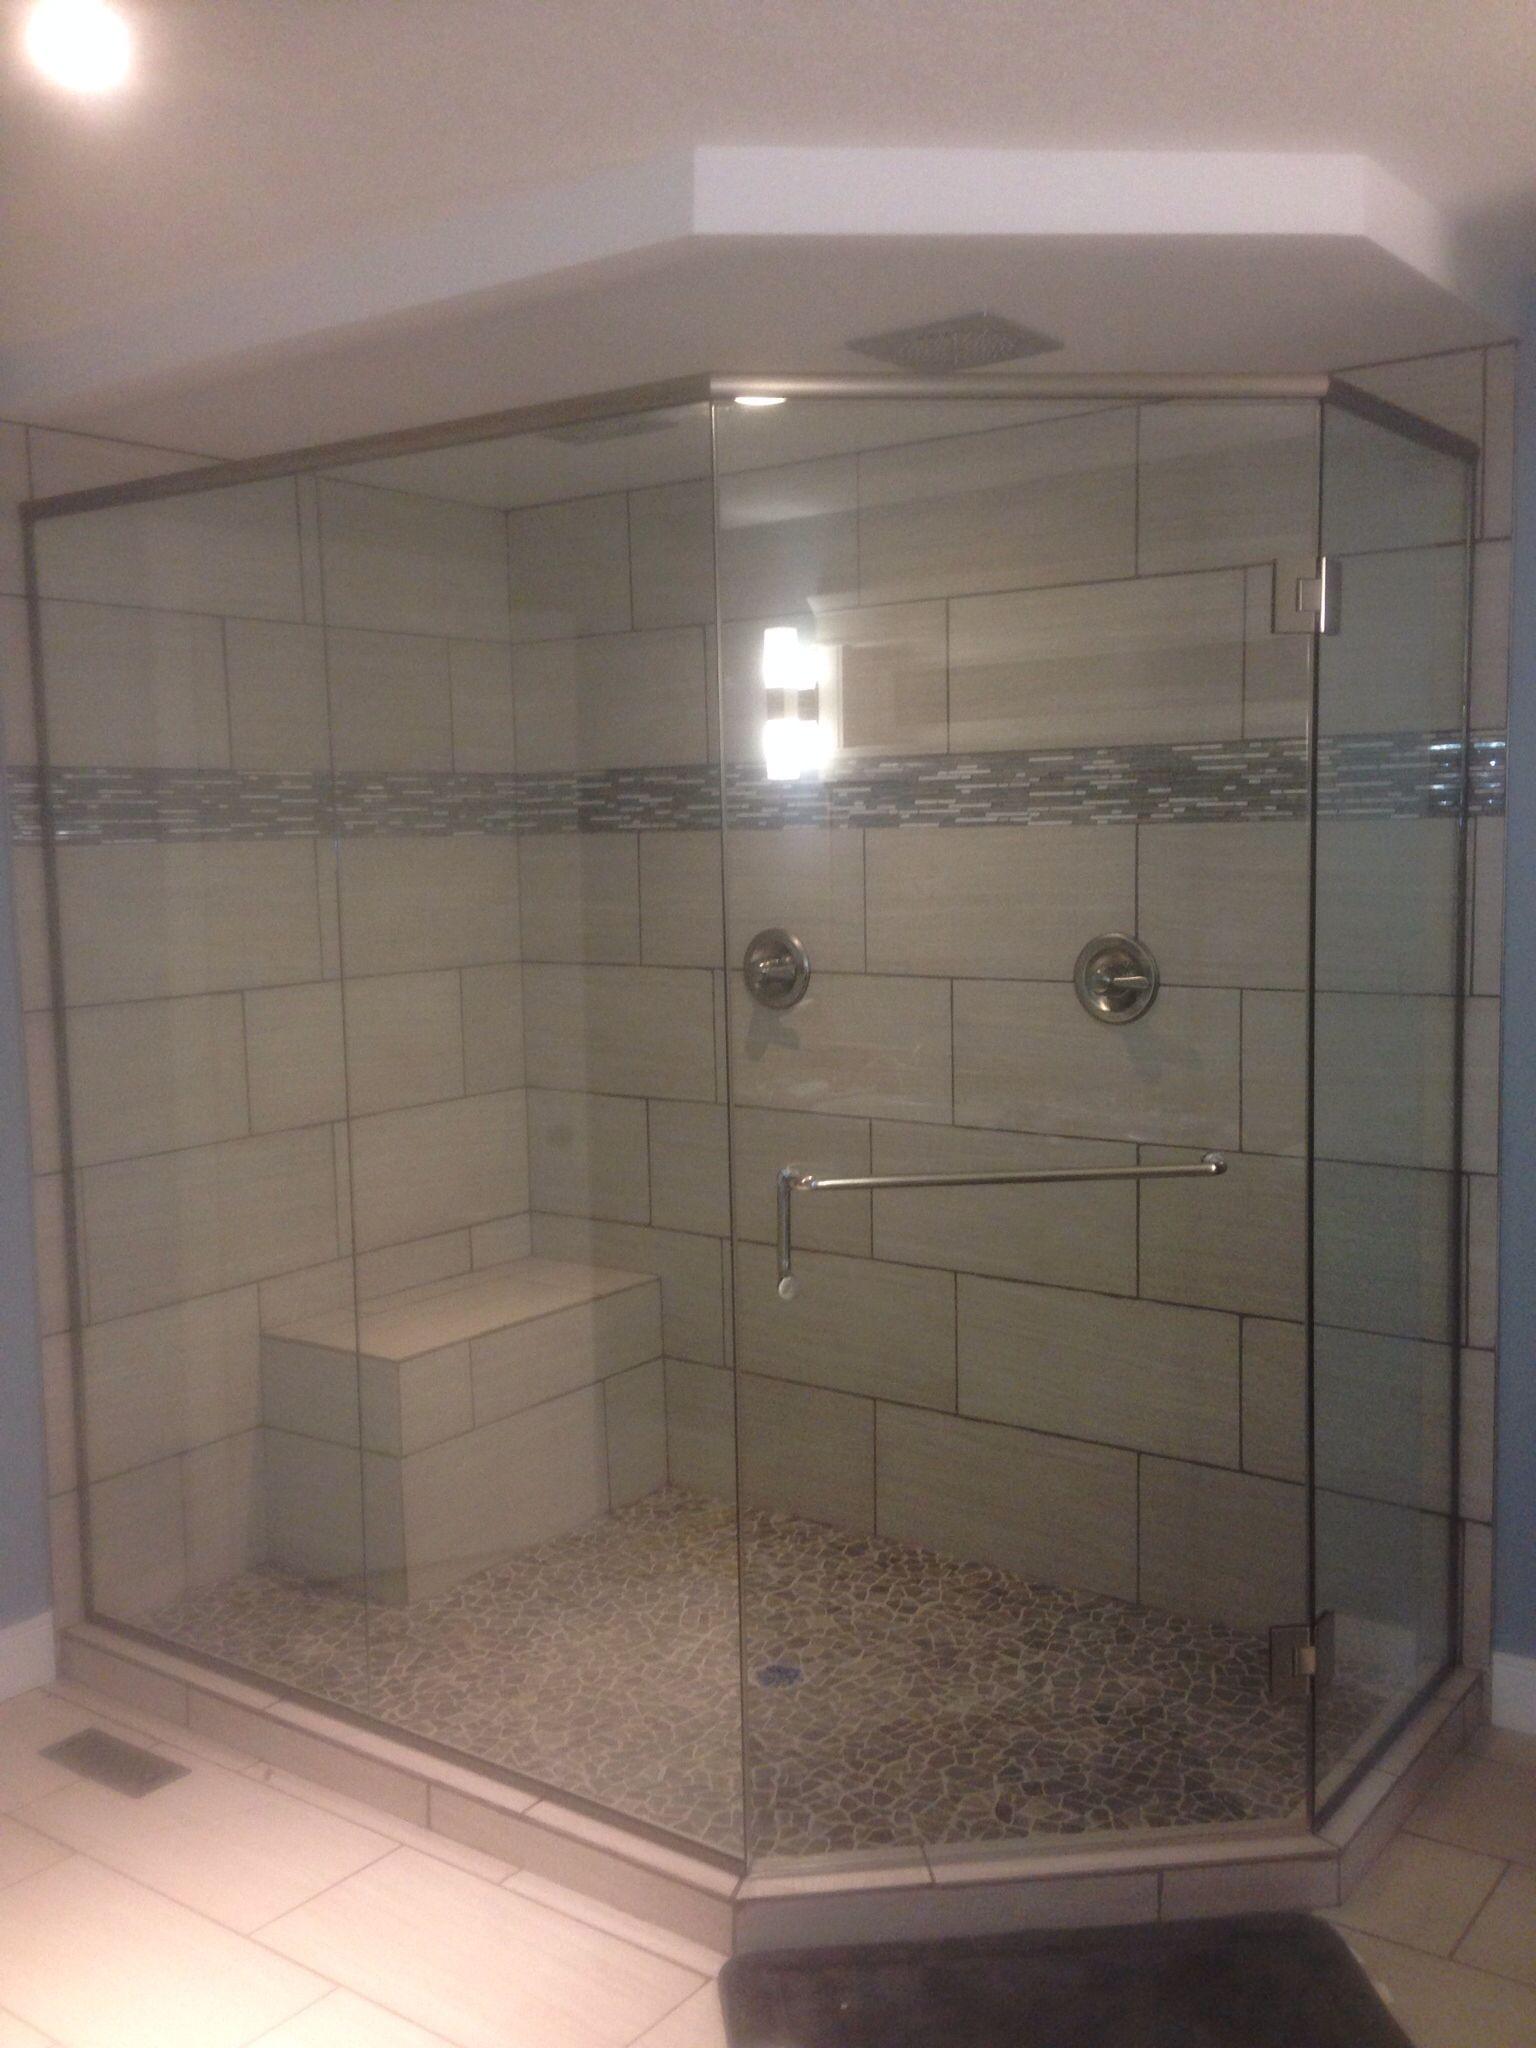 Full view neo angle shower enclosure Dual flush mounted rain head ...